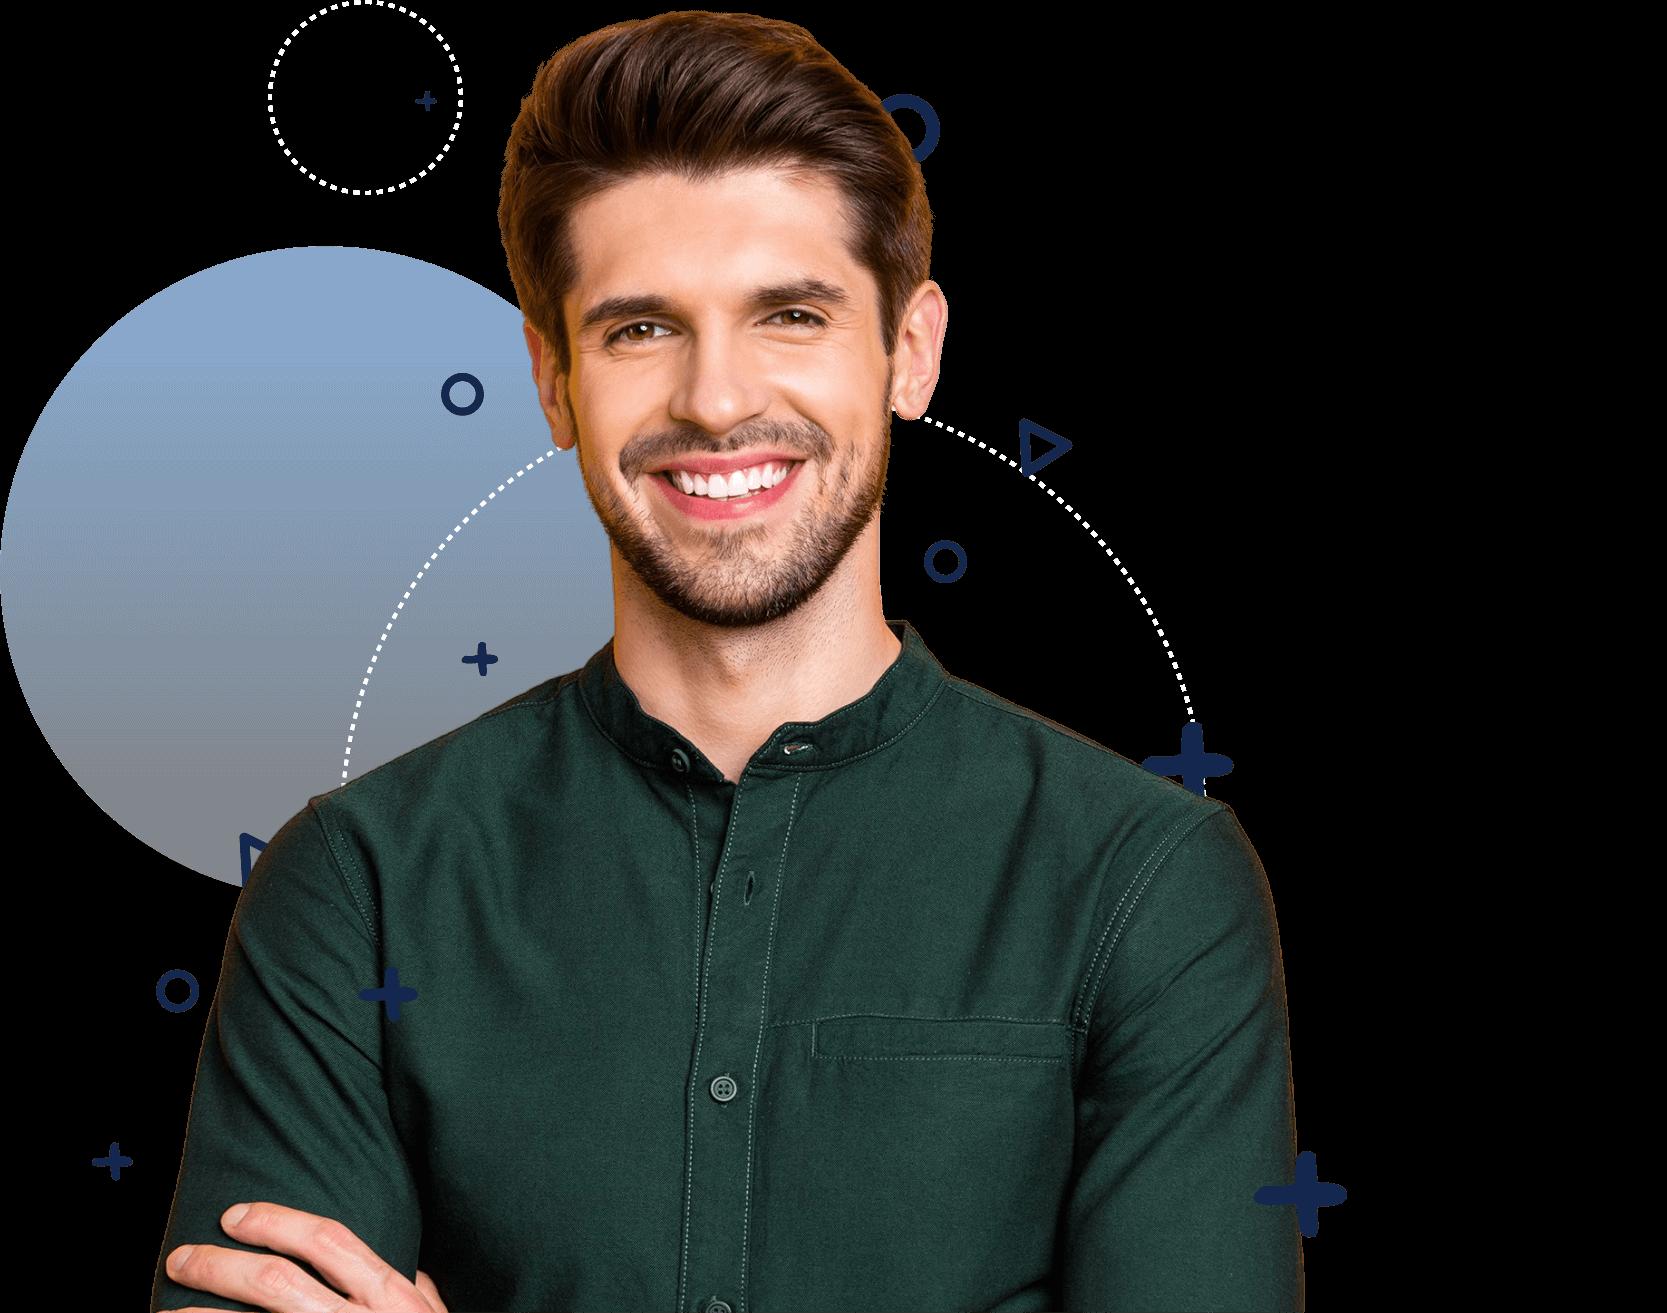 WayMore solutions marketing executive